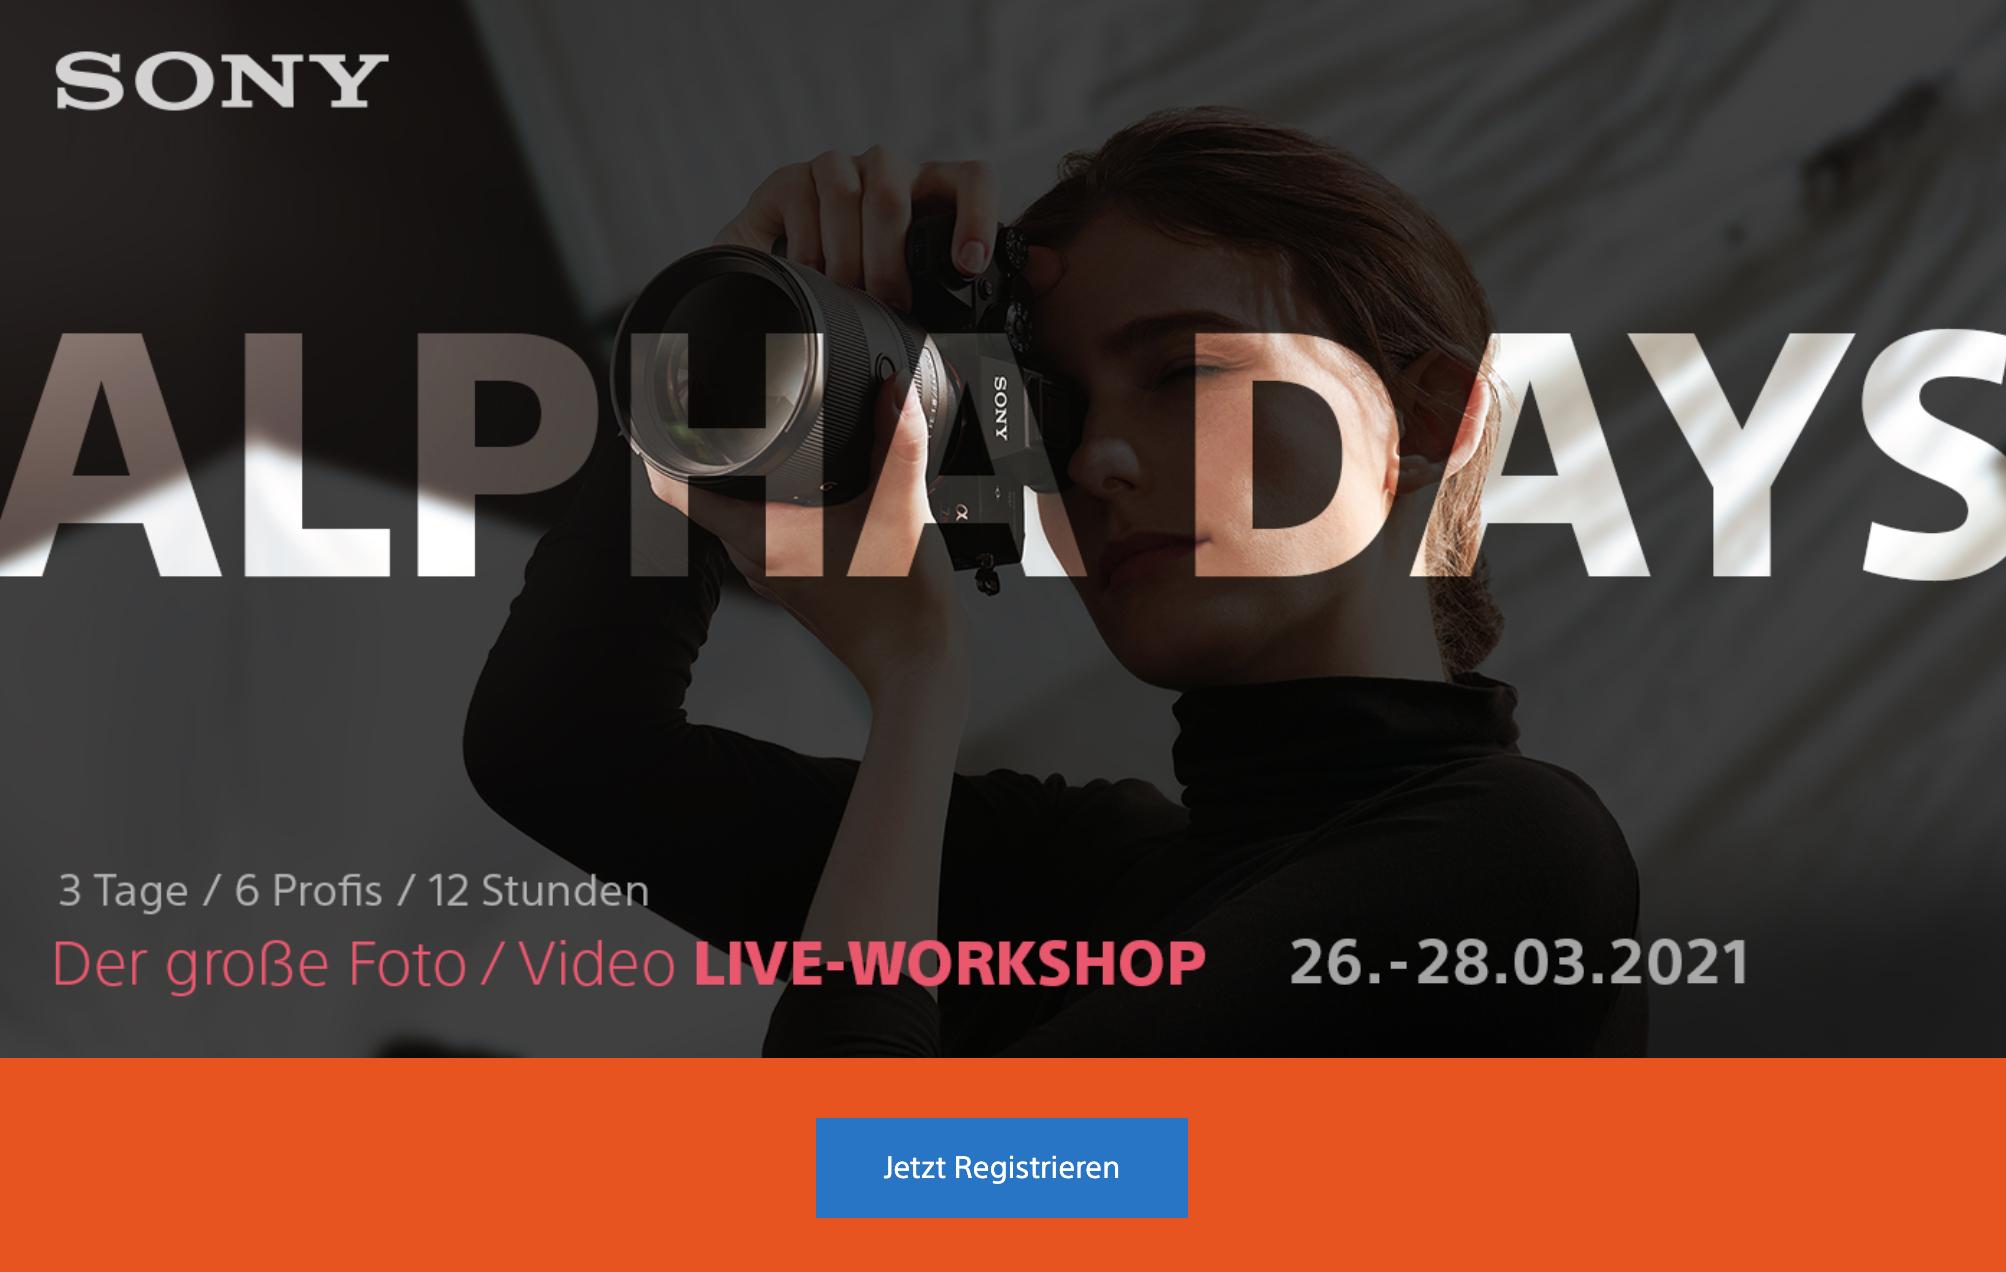 Sony Alpha Days: Ultimativer Sony Guide + Workshop (LEVEL 1 des ULTIMATIVE Sony Alpha Kurses gratis)